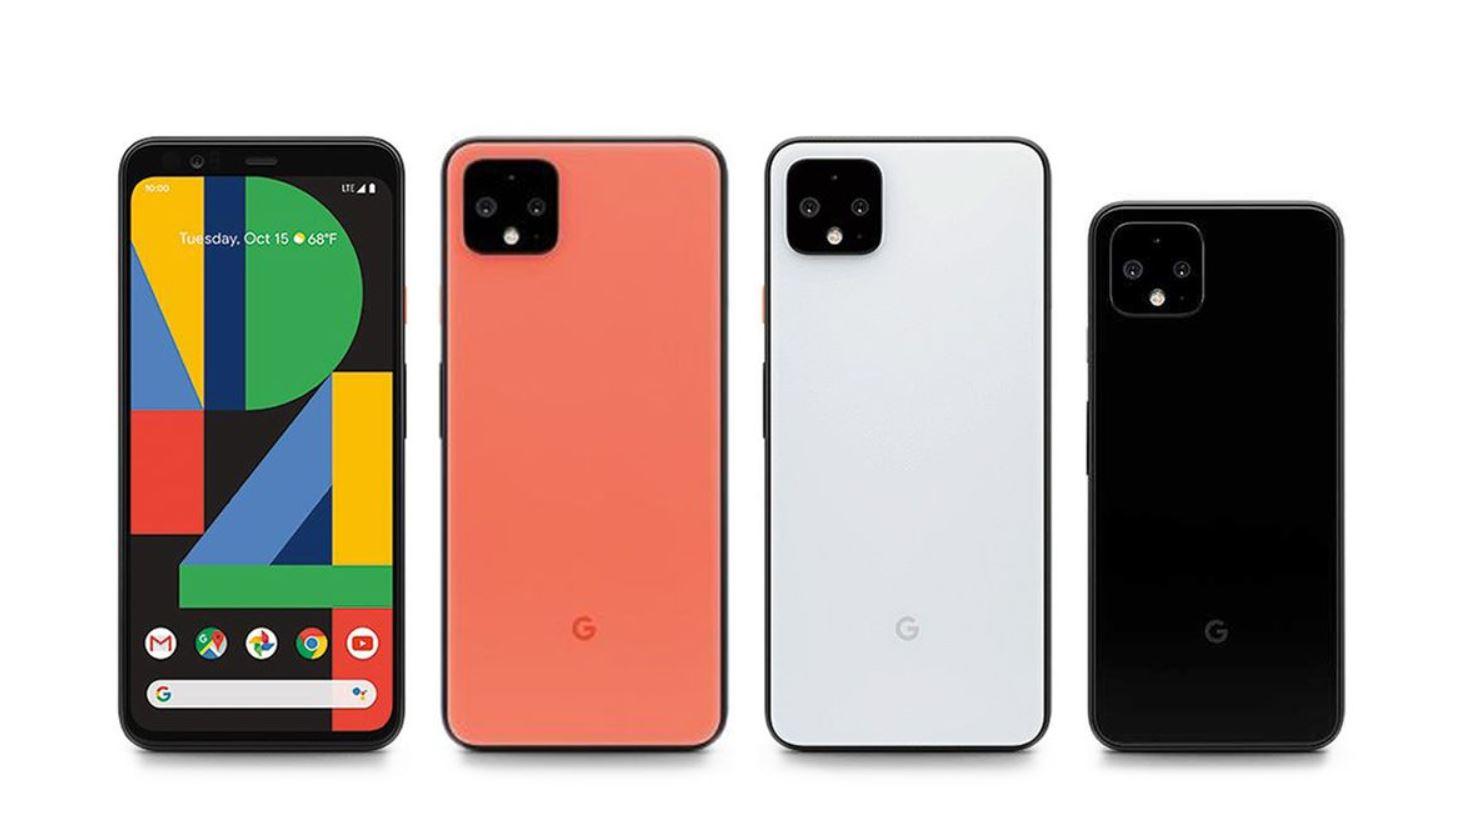 google pixel 4 and pixel 4 xl